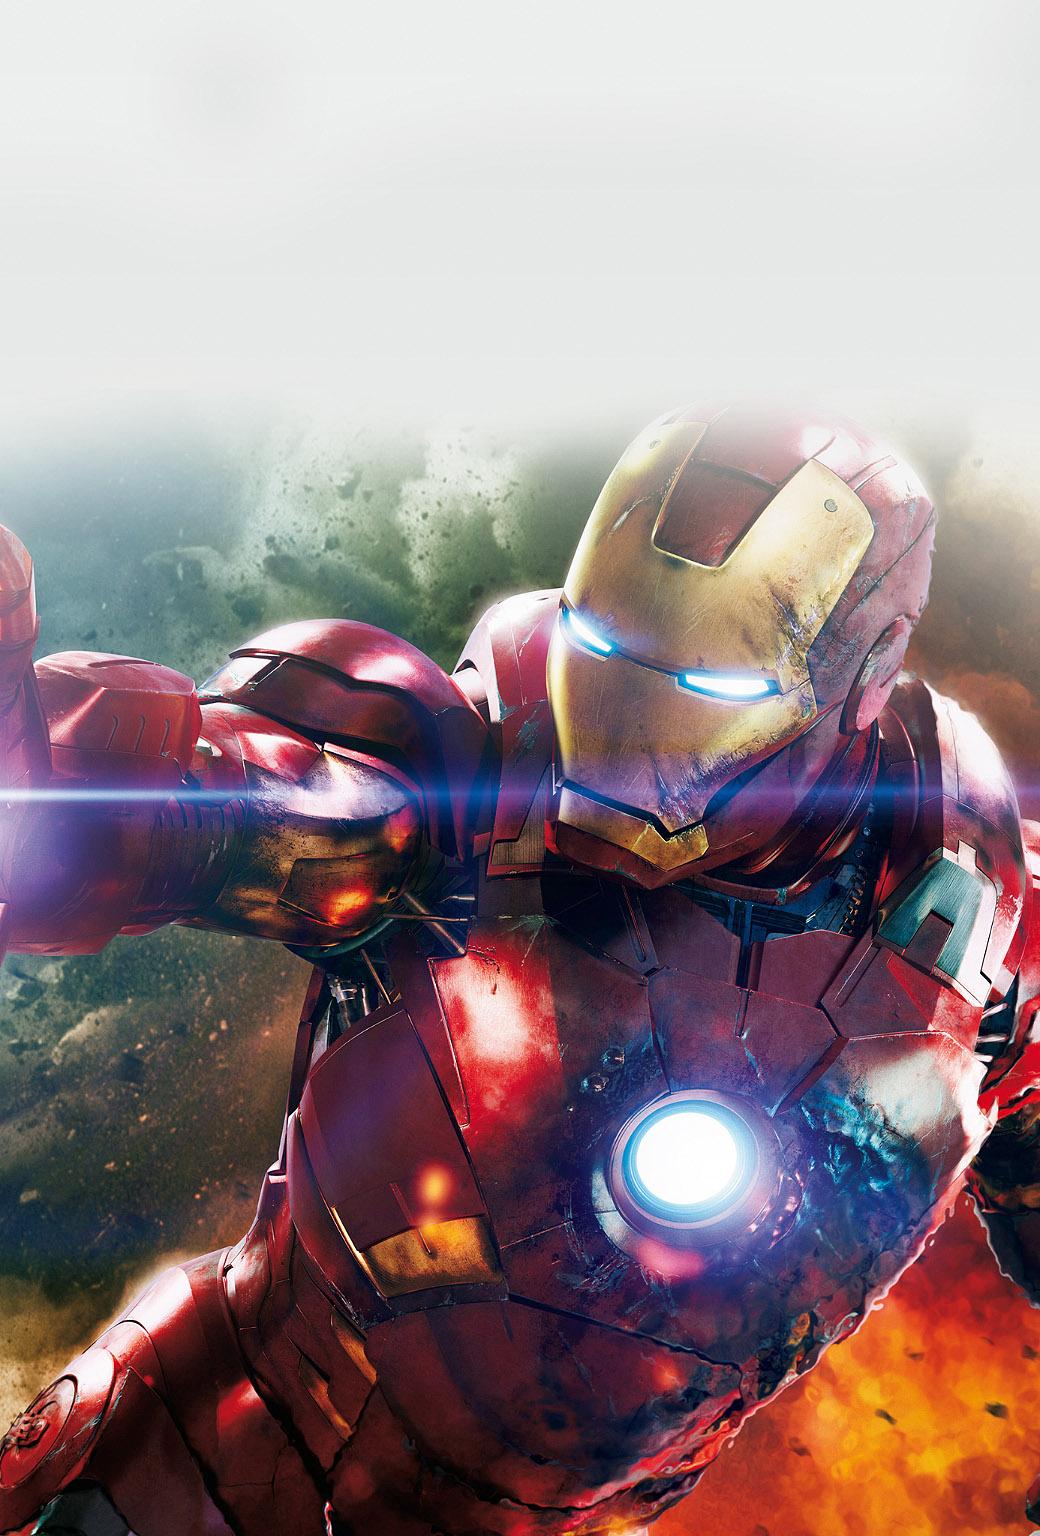 Iron Man Wallpaper 34447: Ironman Wallpaper Iphone 5